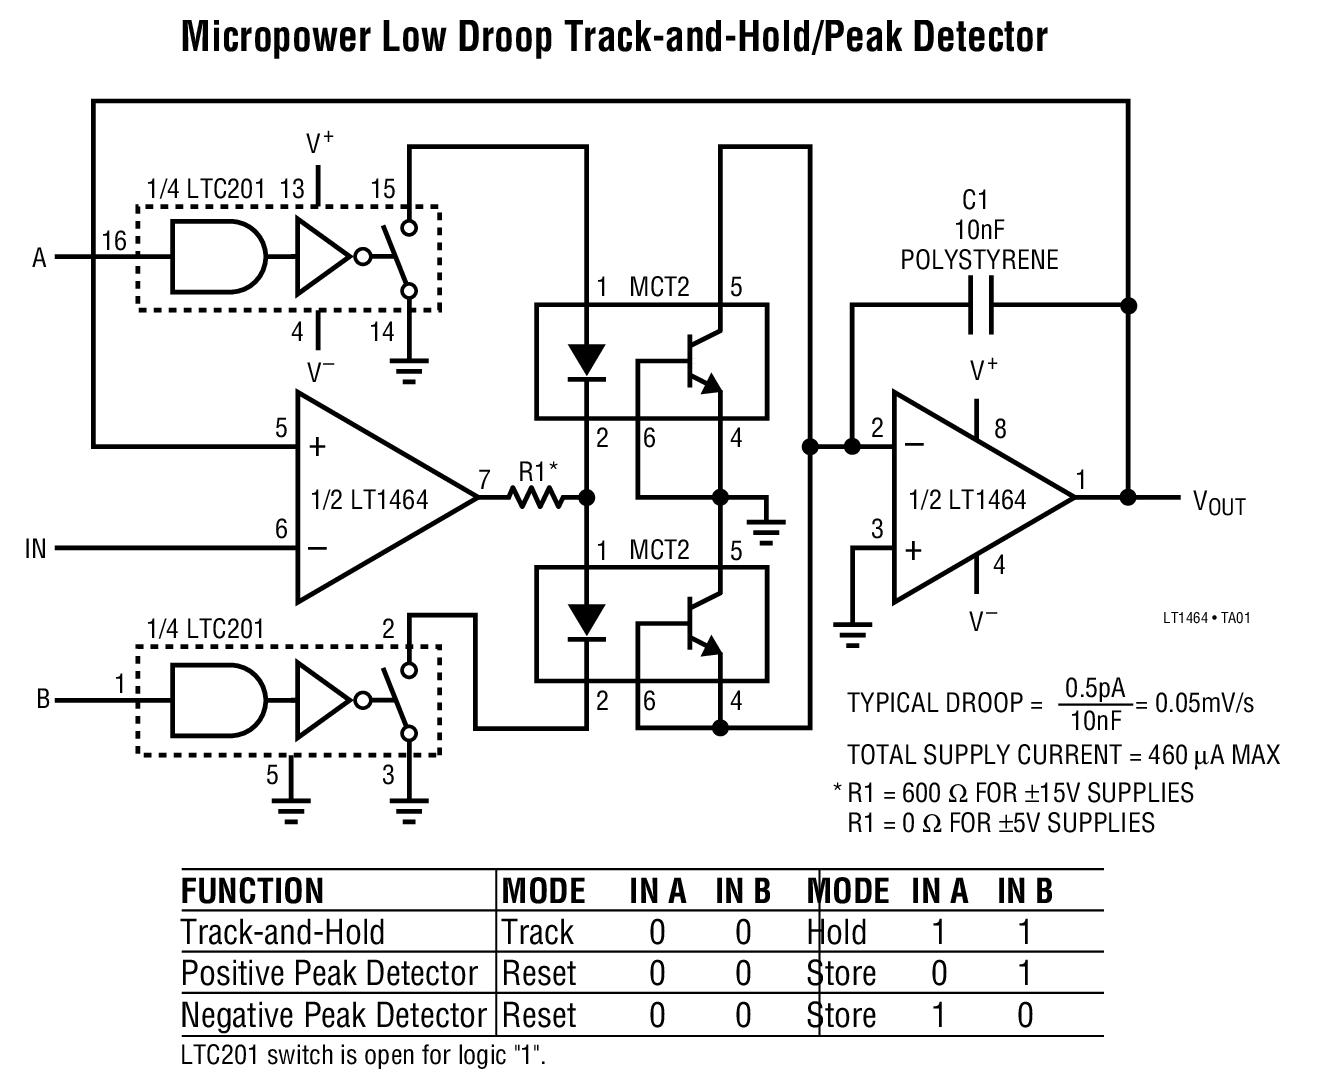 LT1464 双通道微功率、1 MHz C-Lo...